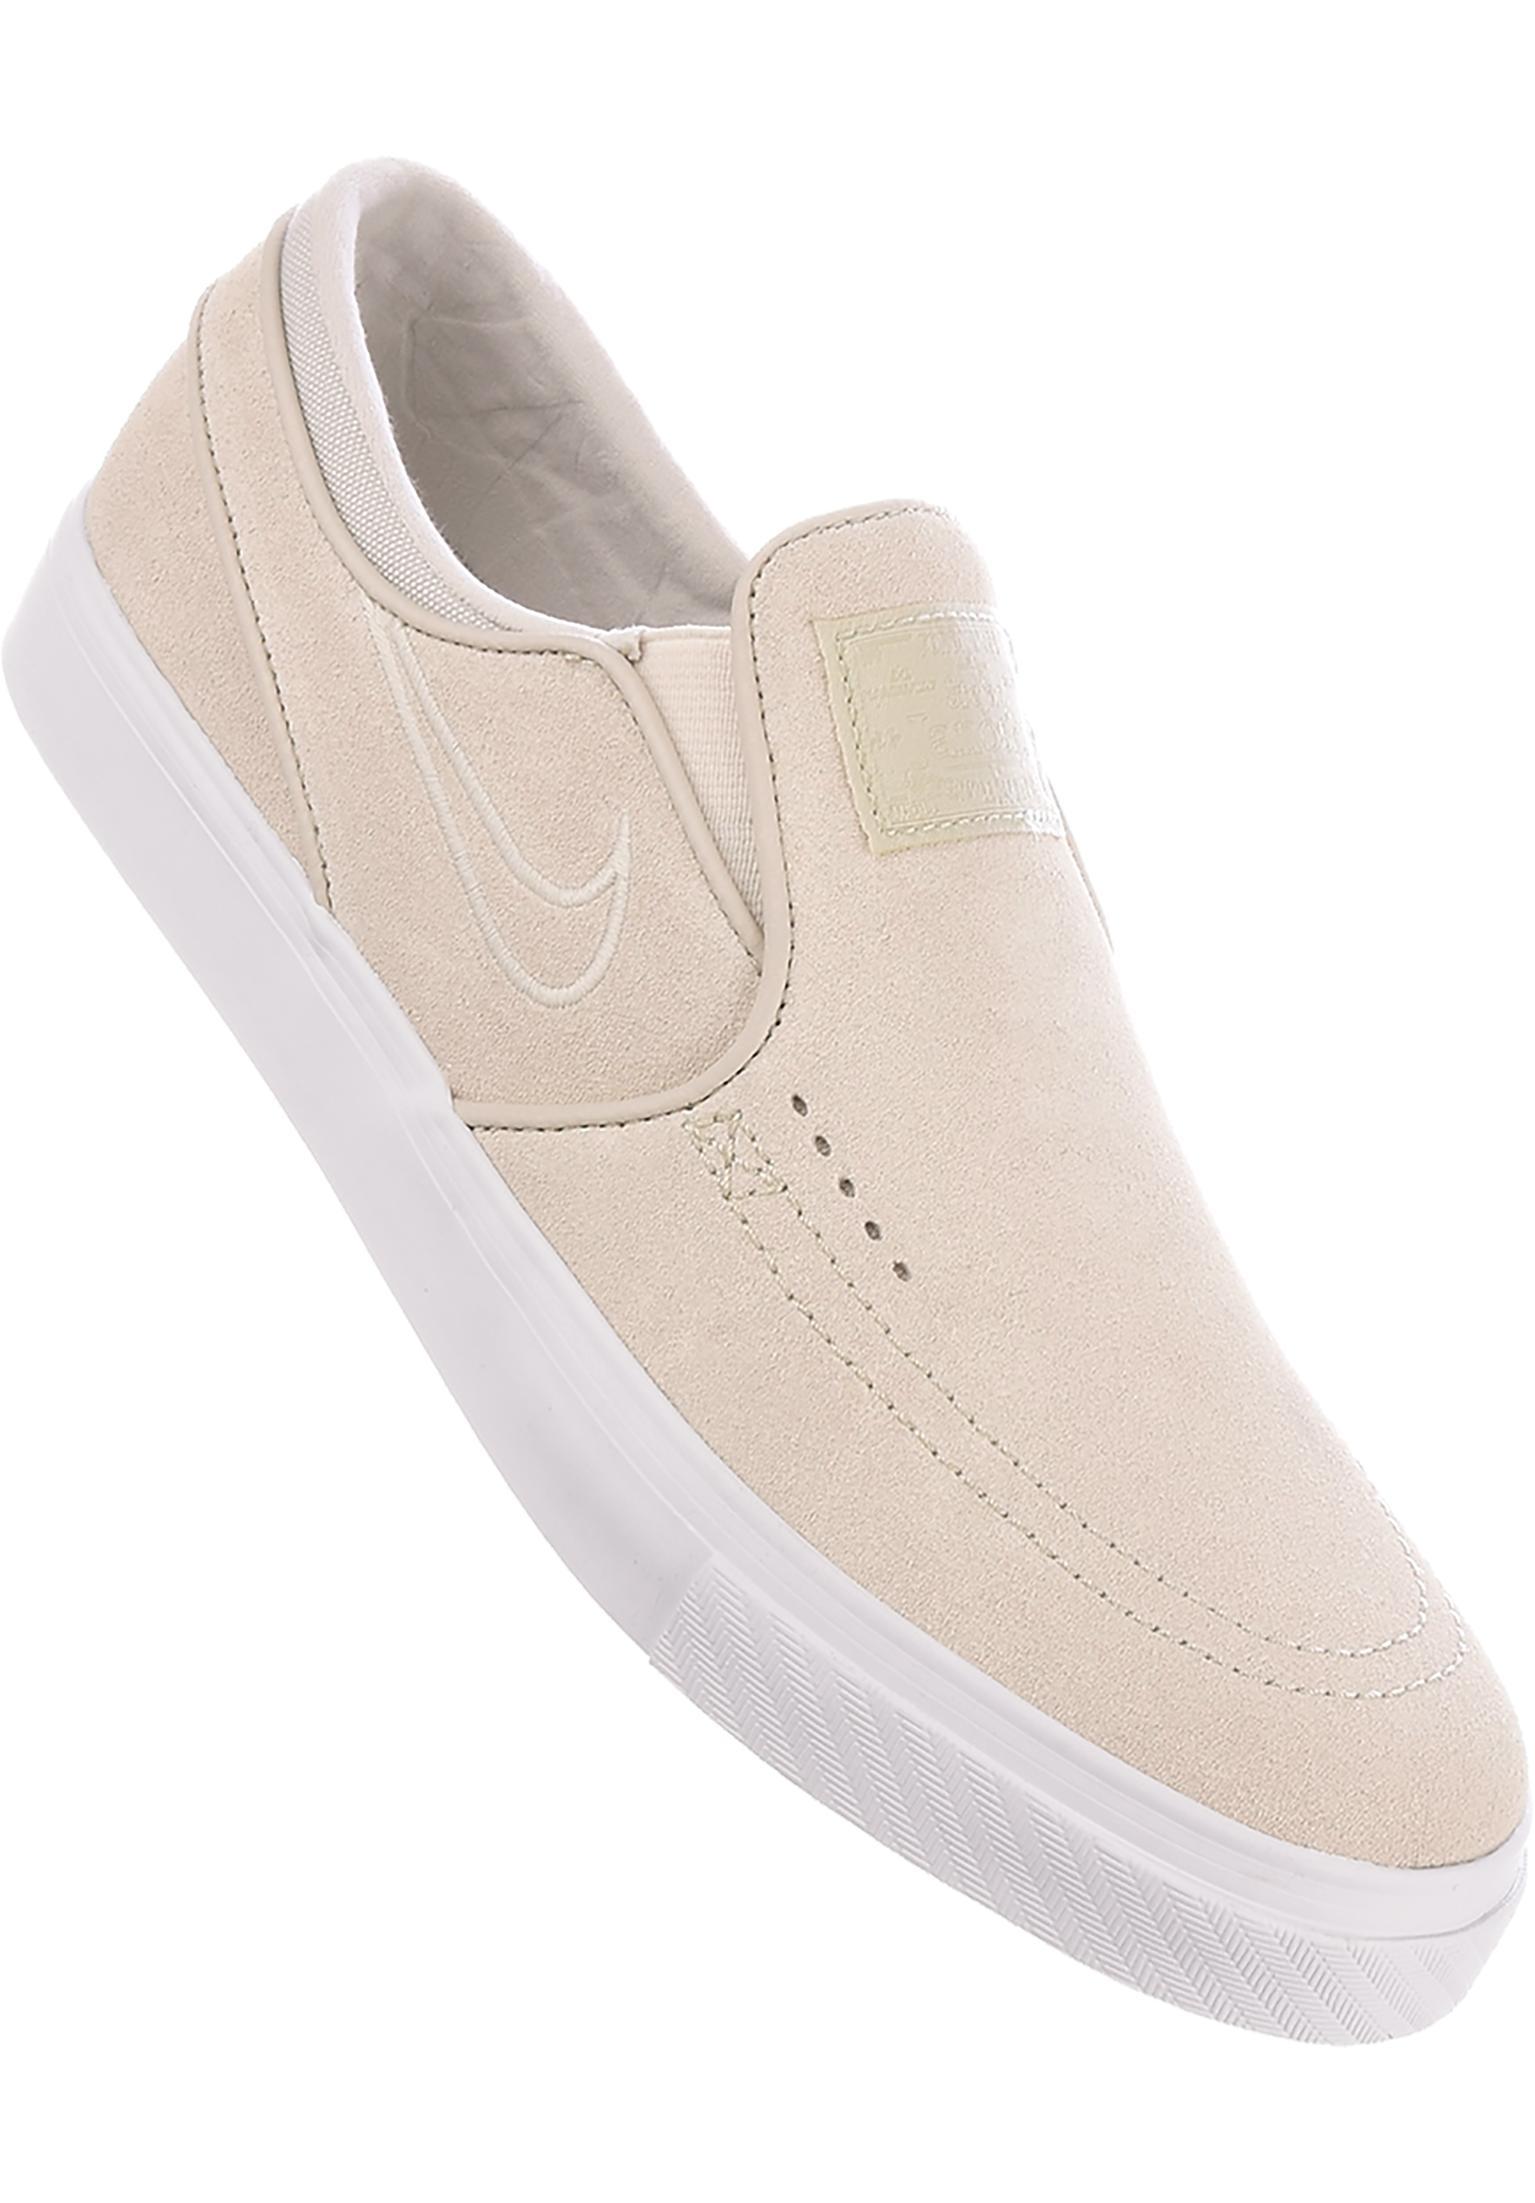 43b4b2a21f61a3 Zoom Stefan Janoski Slip On Nike SB All Shoes in white-lightbone for Men